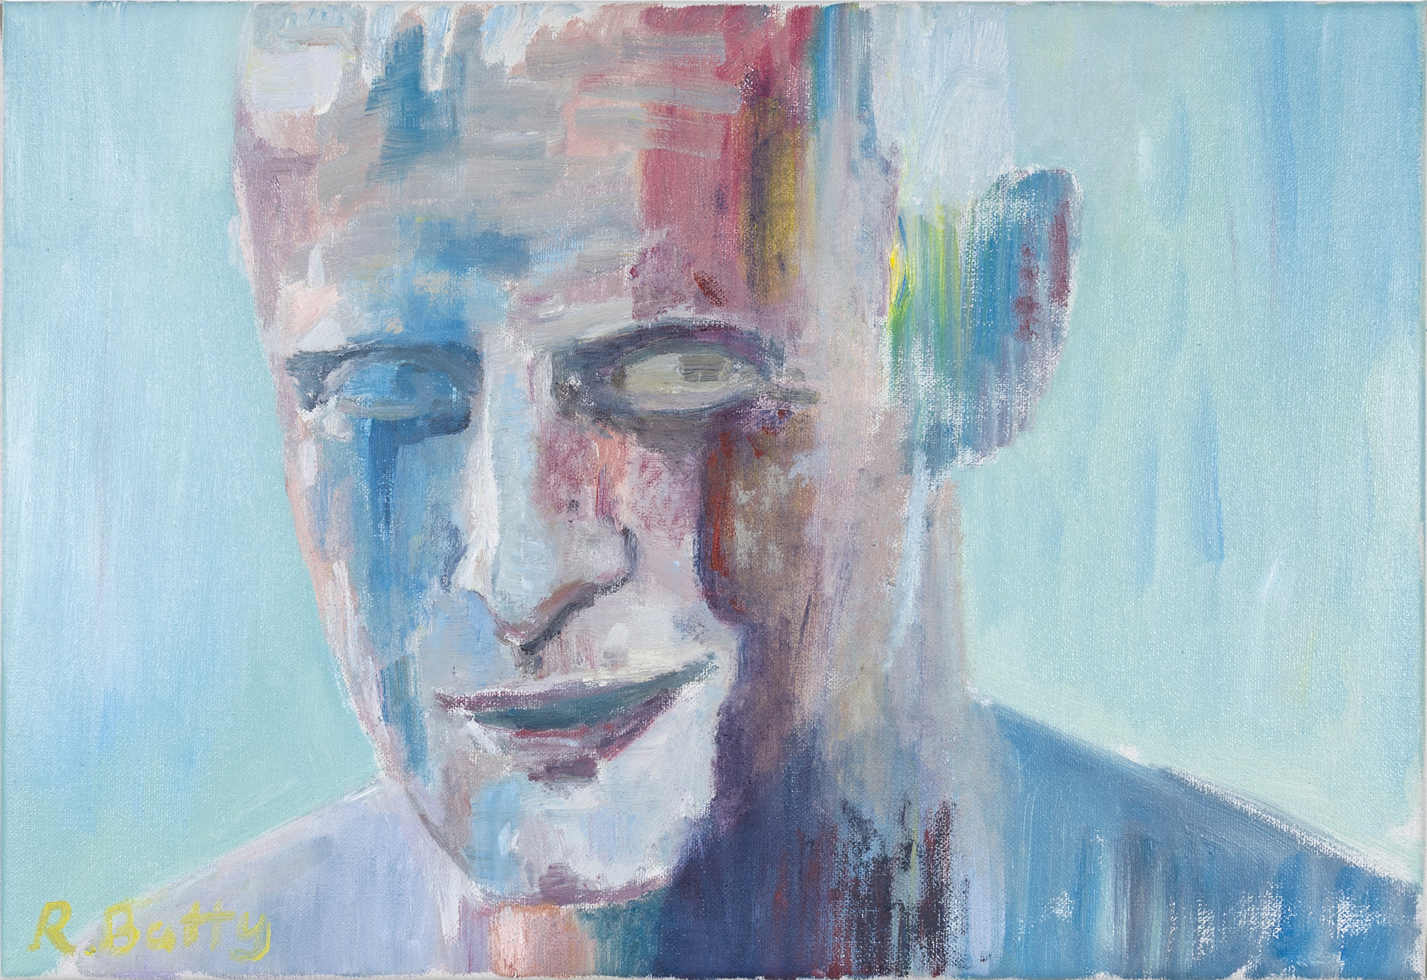 NICK COLLERSON  A Self Portrait , 2018 oil on linen 38 x 56 cm